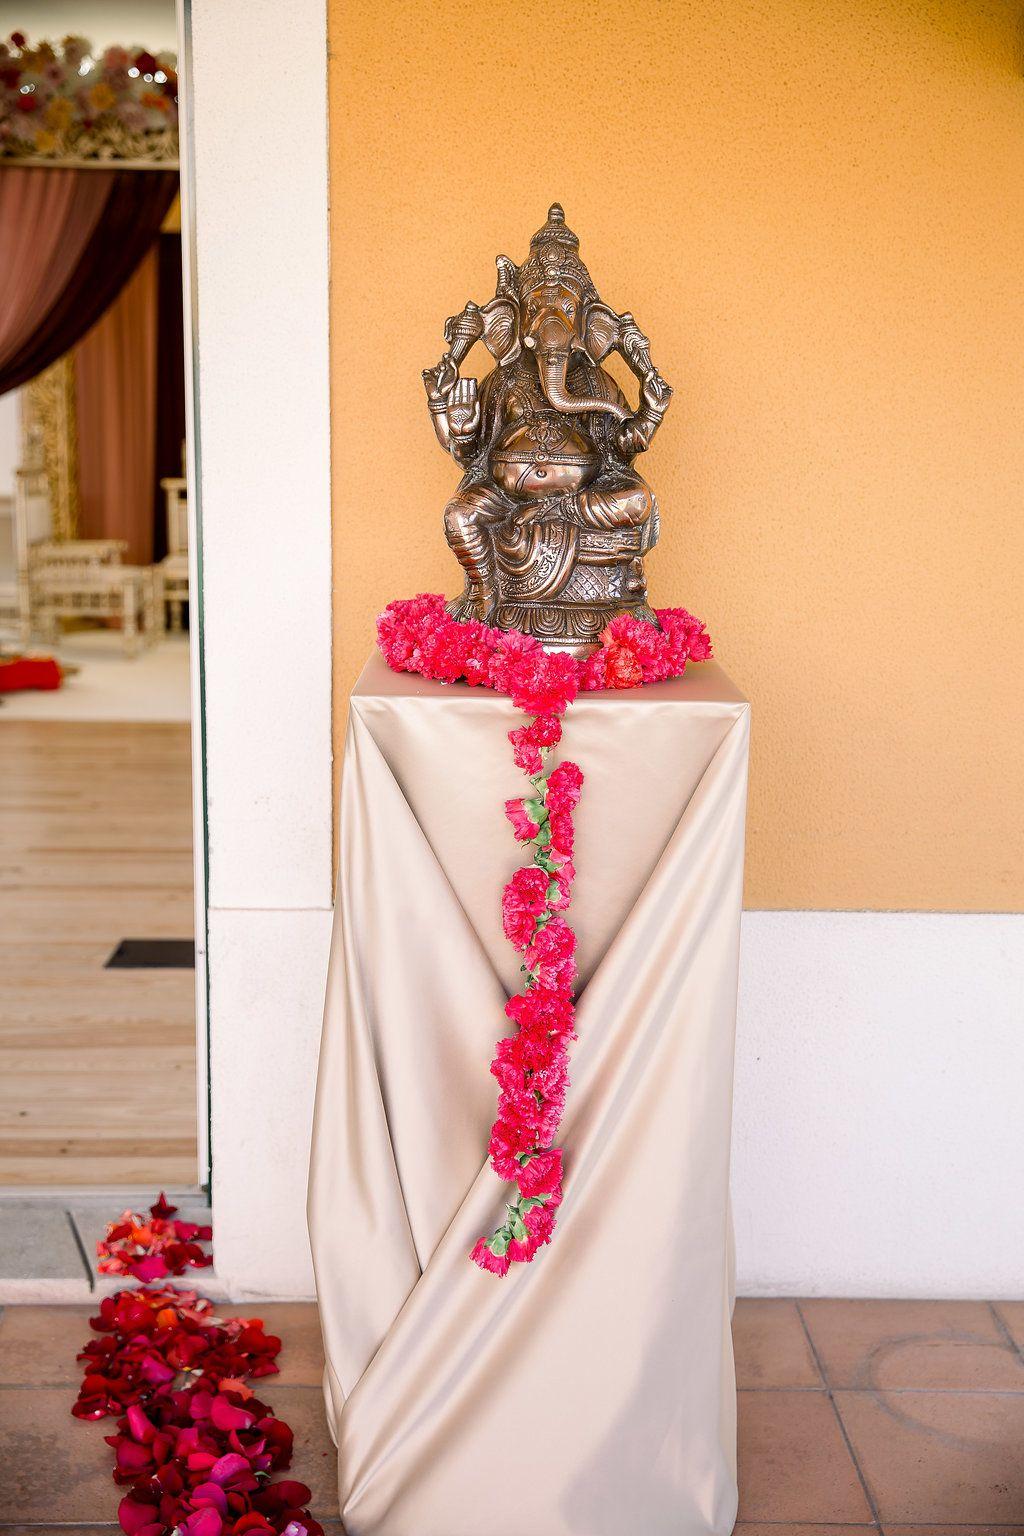 Pin de Destination Weddings in Portug em Indian Weddingin